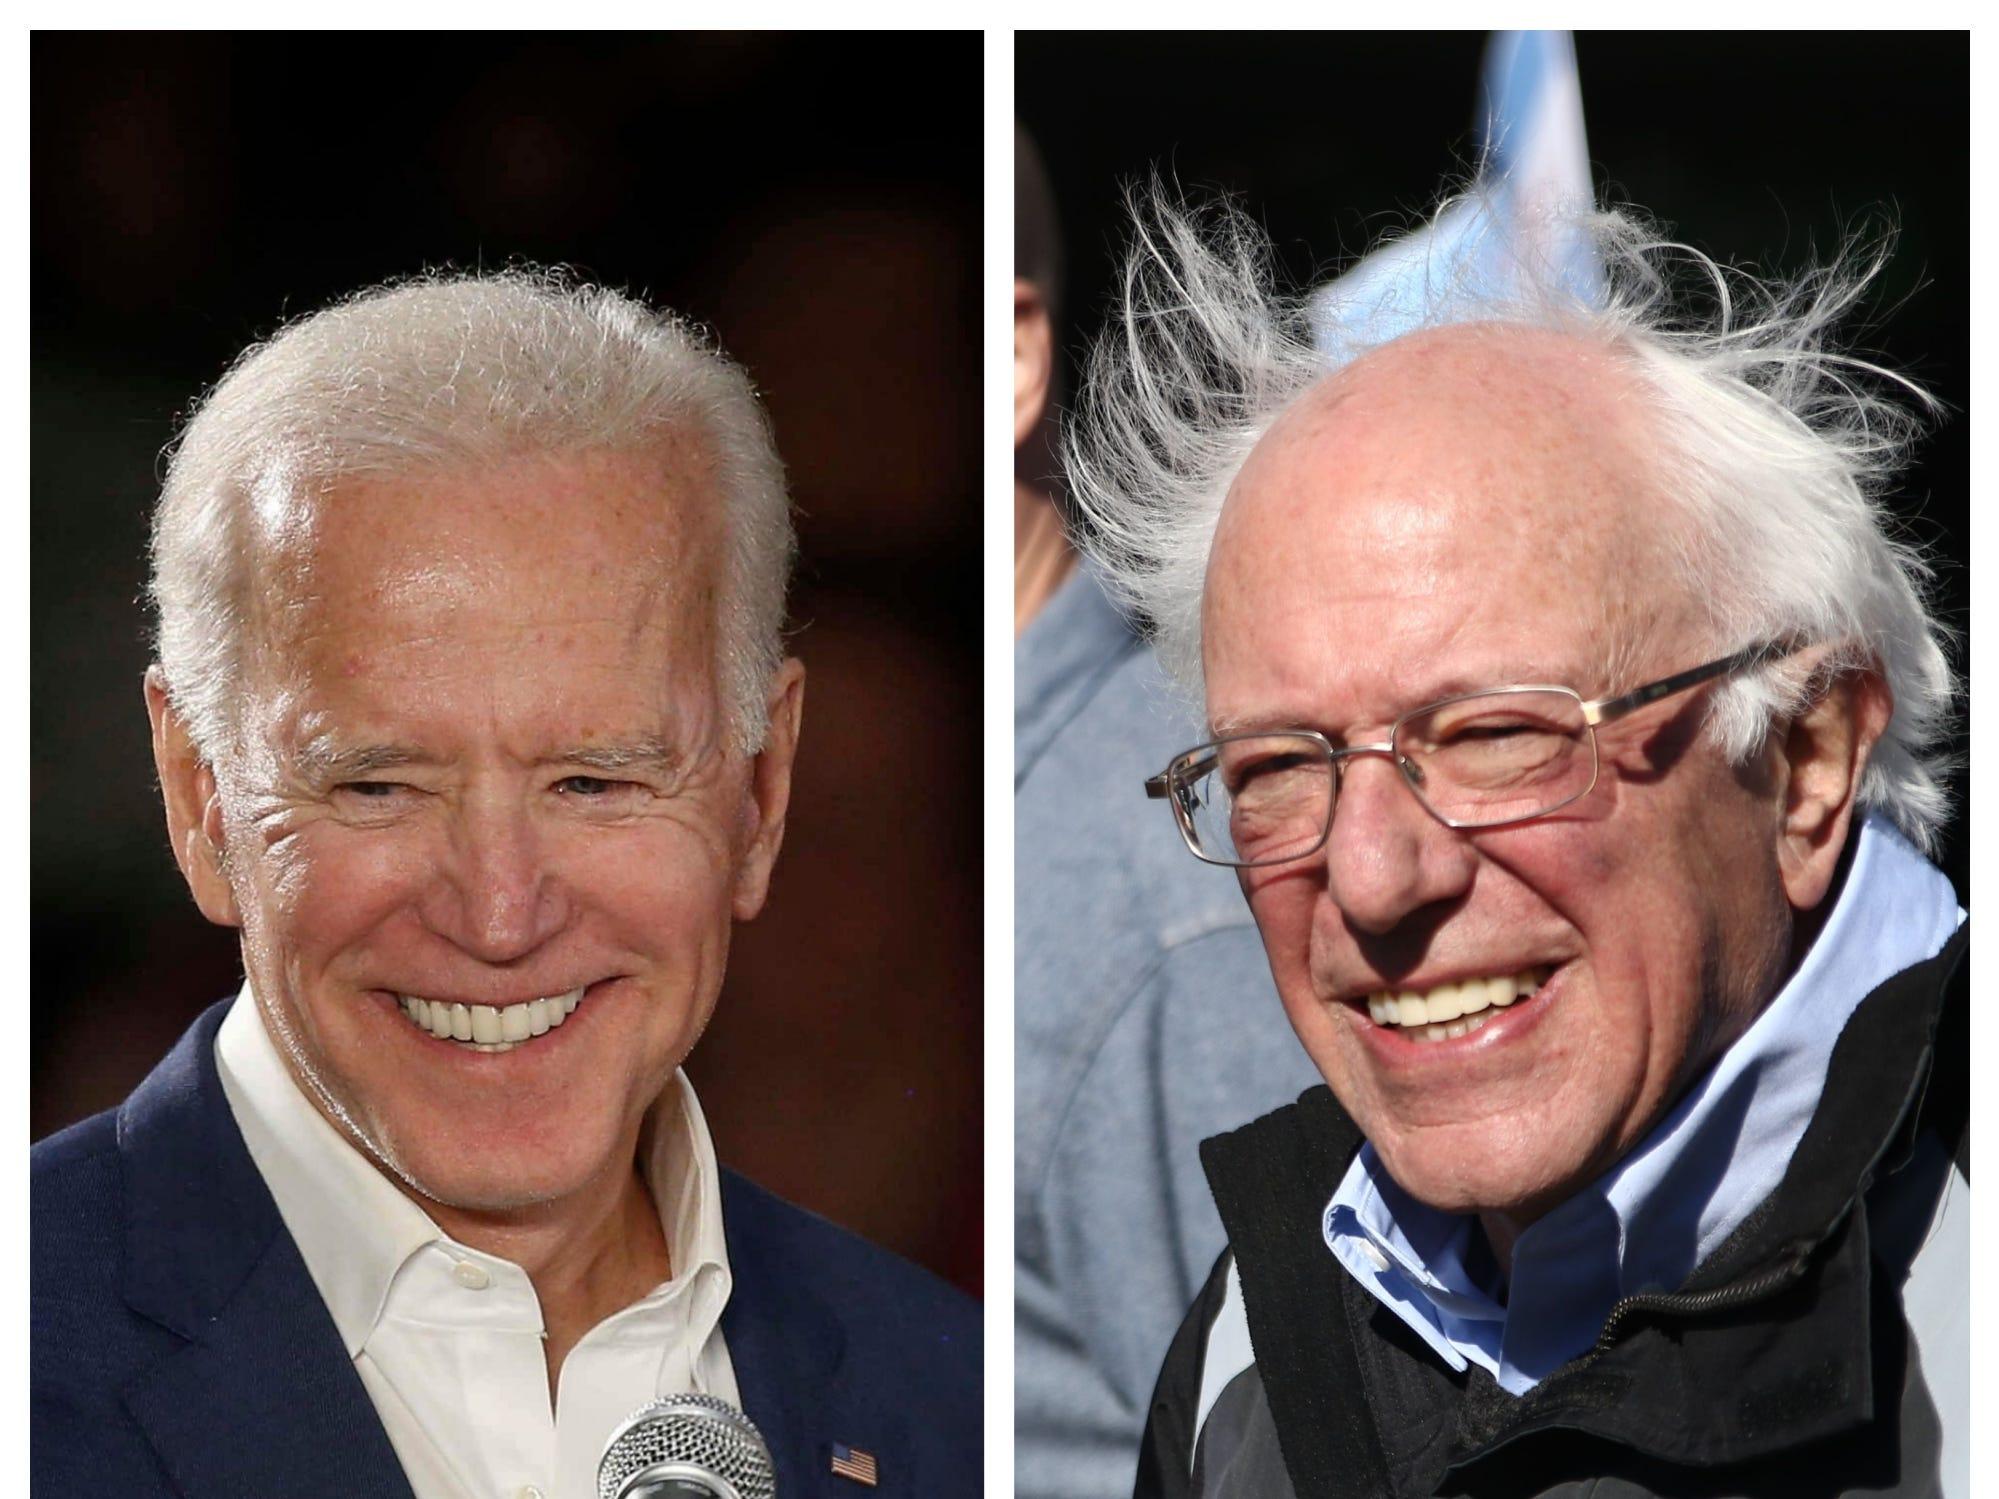 VT Insights: Name recognition keeps Bernie Sanders, Joe Biden tops in Democratic field